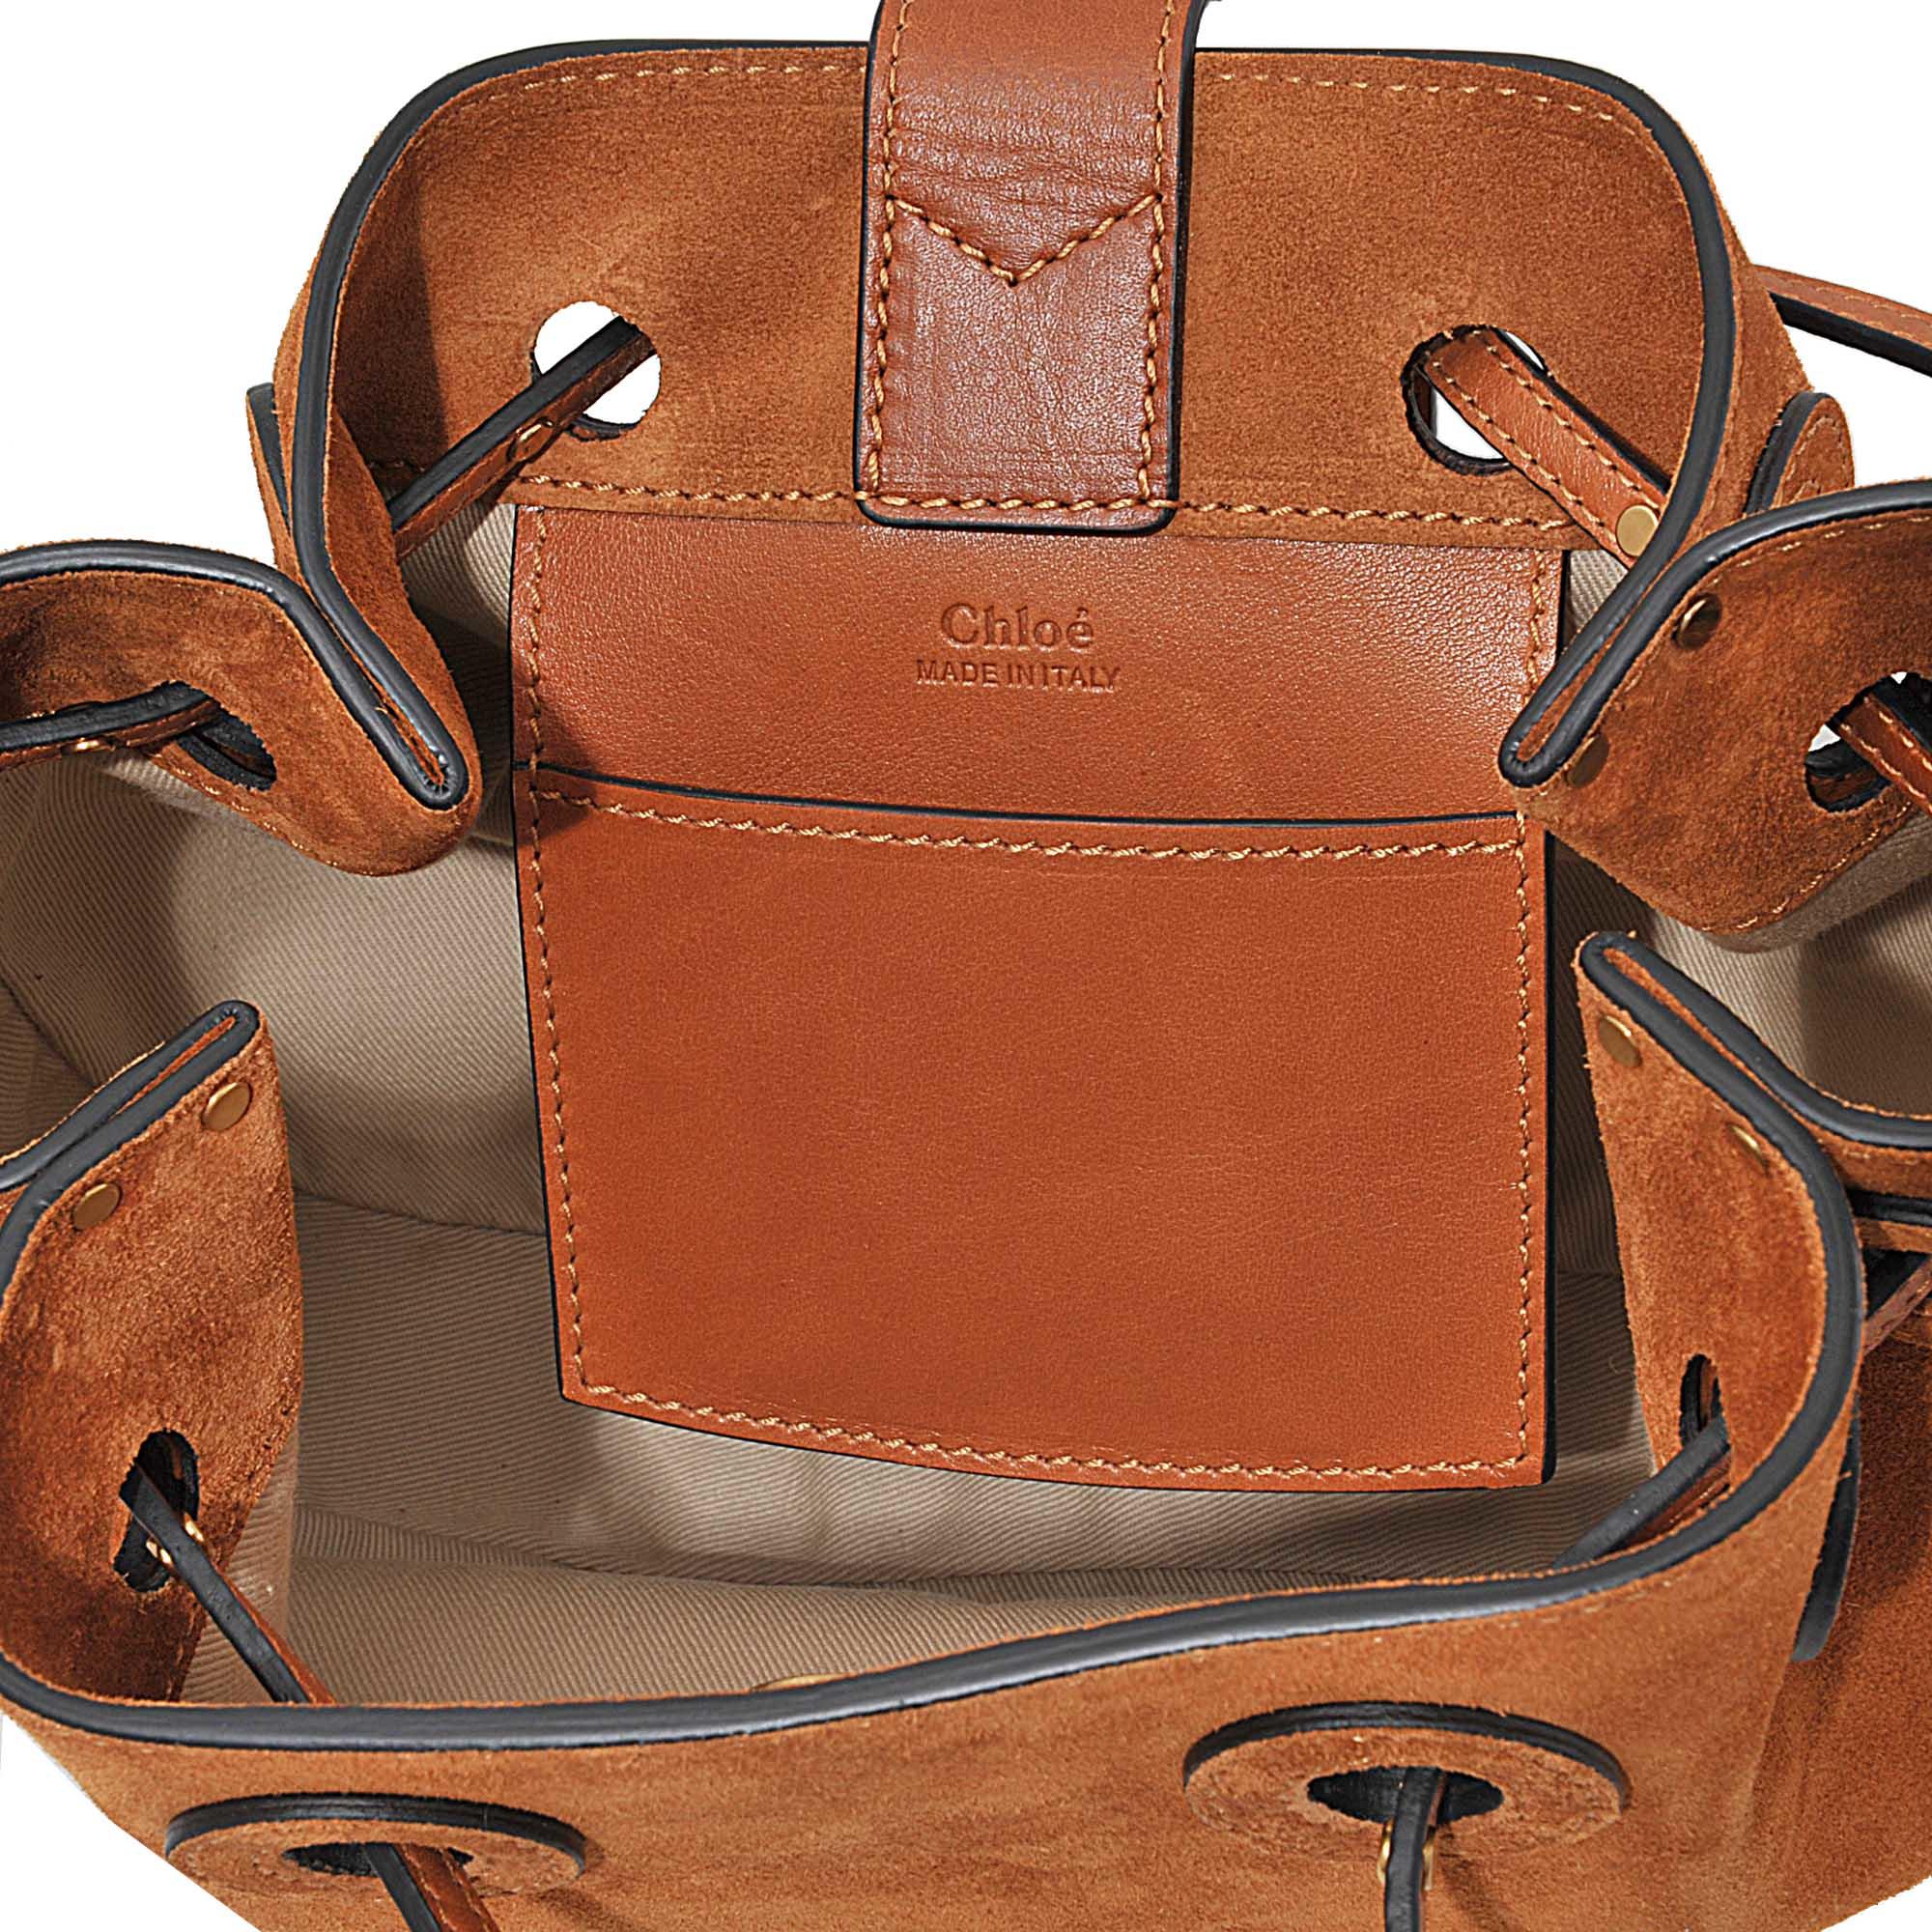 184dc63dec54 Lyst - Chloé Inez Small Drawstring Bag in Brown